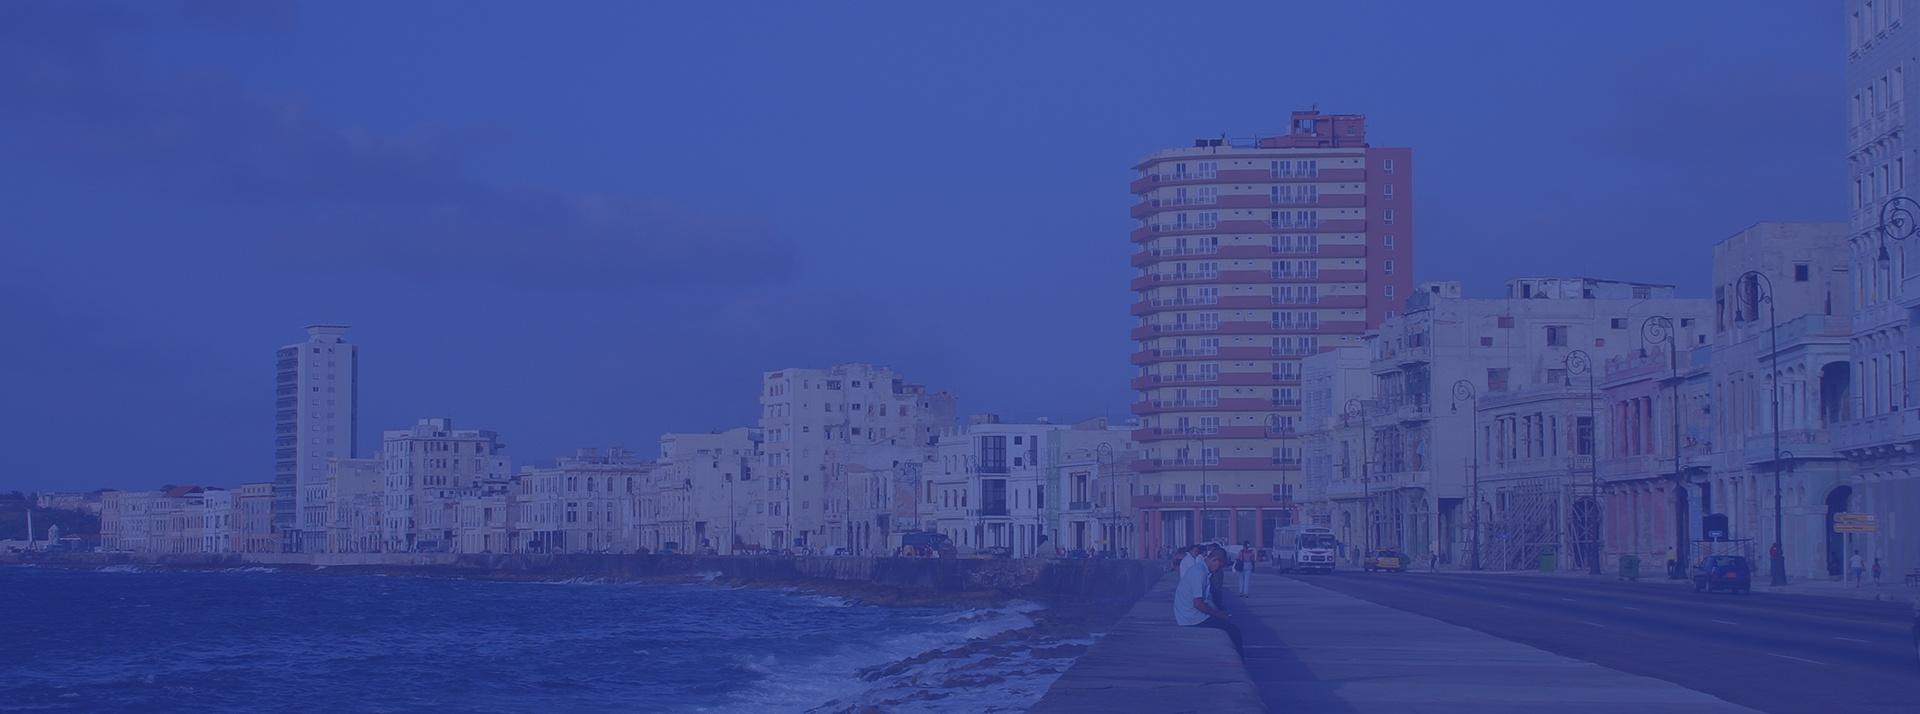 Feira Internacional de Havana 2017